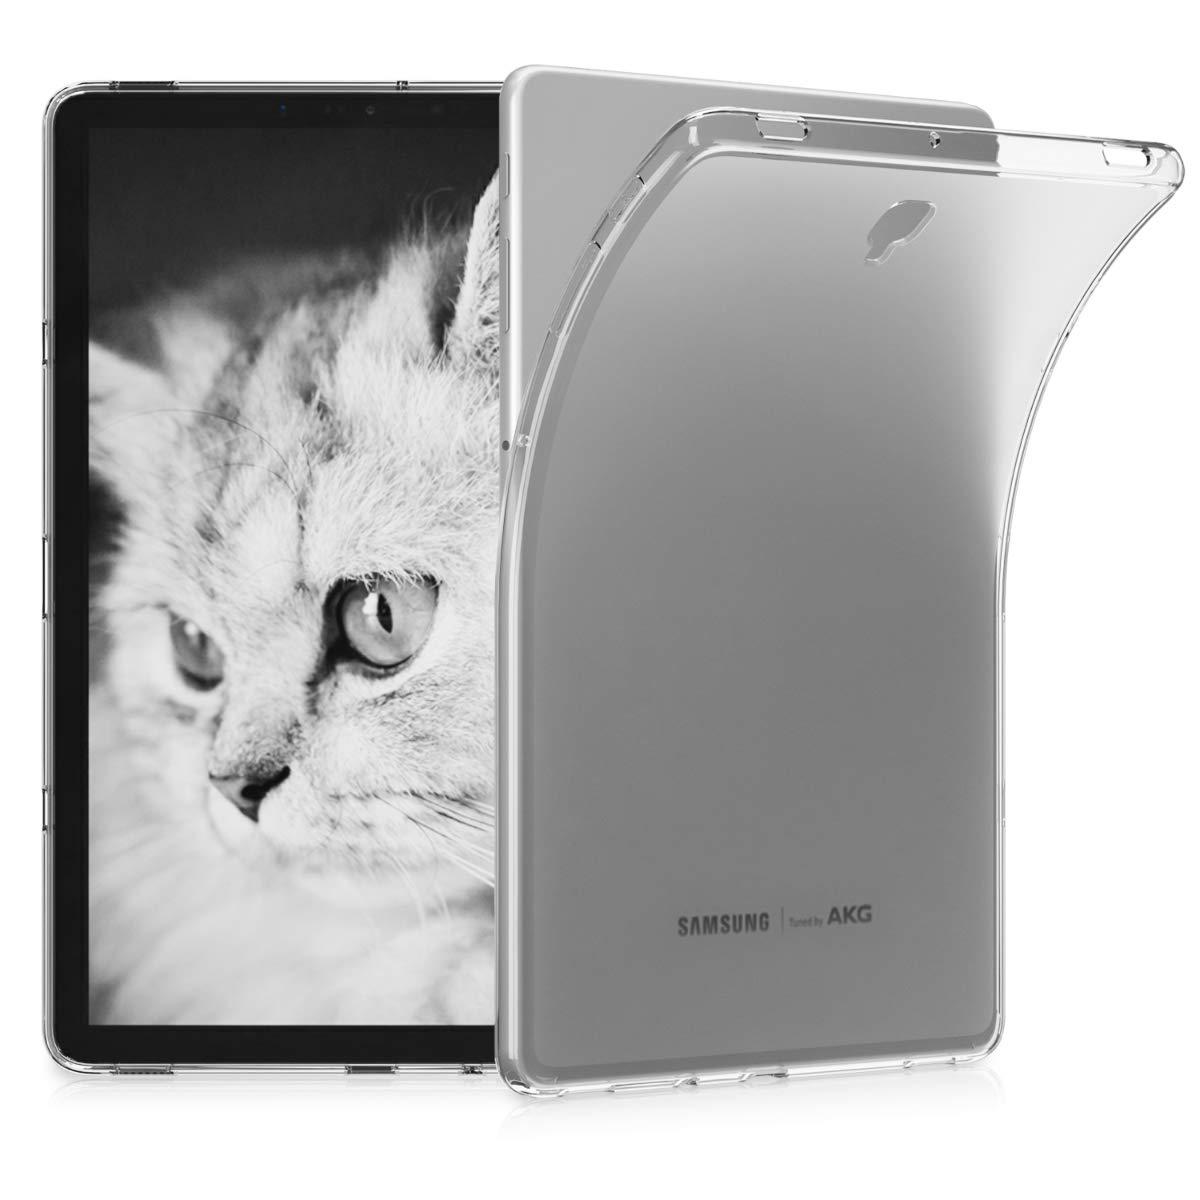 Funda Samsung Galaxy Tab S4 10.5 Kwmobile [7hkkj9hd]